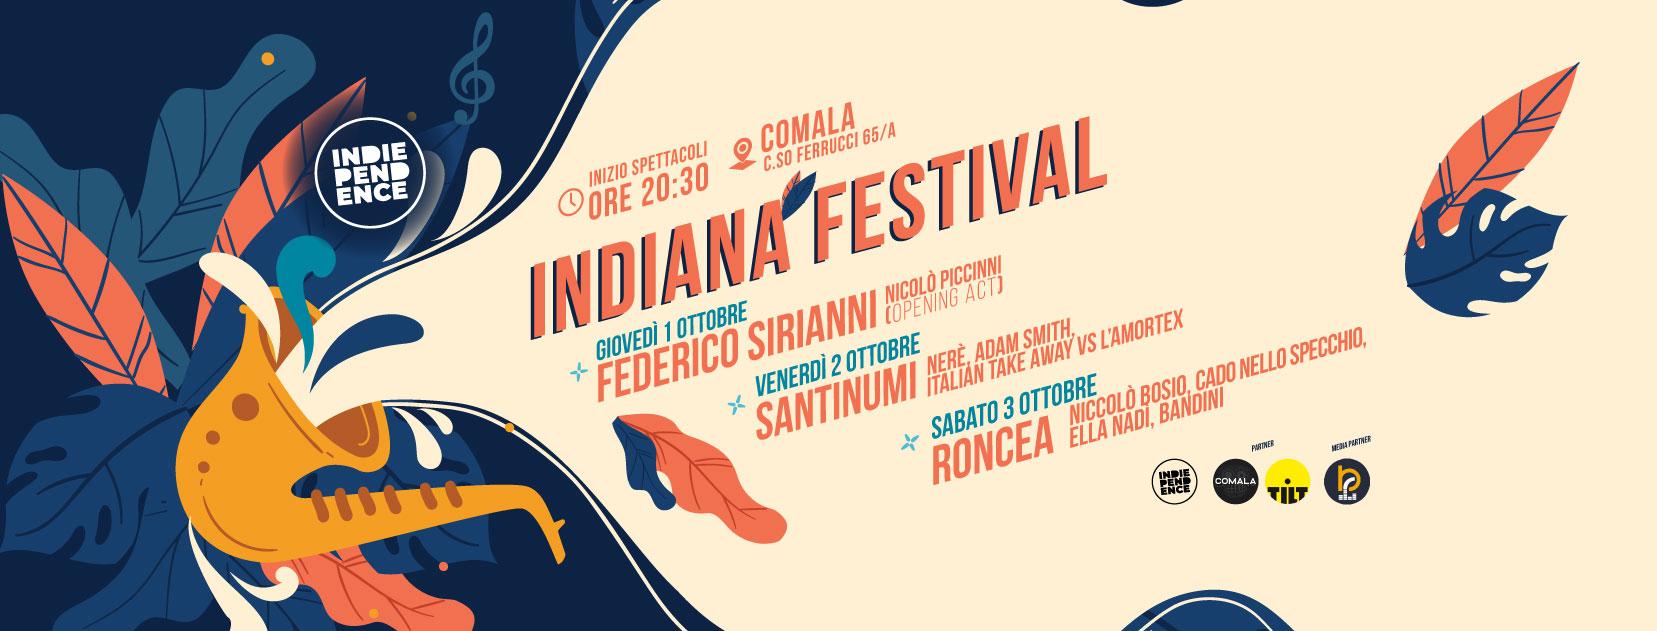 Indiana Festival